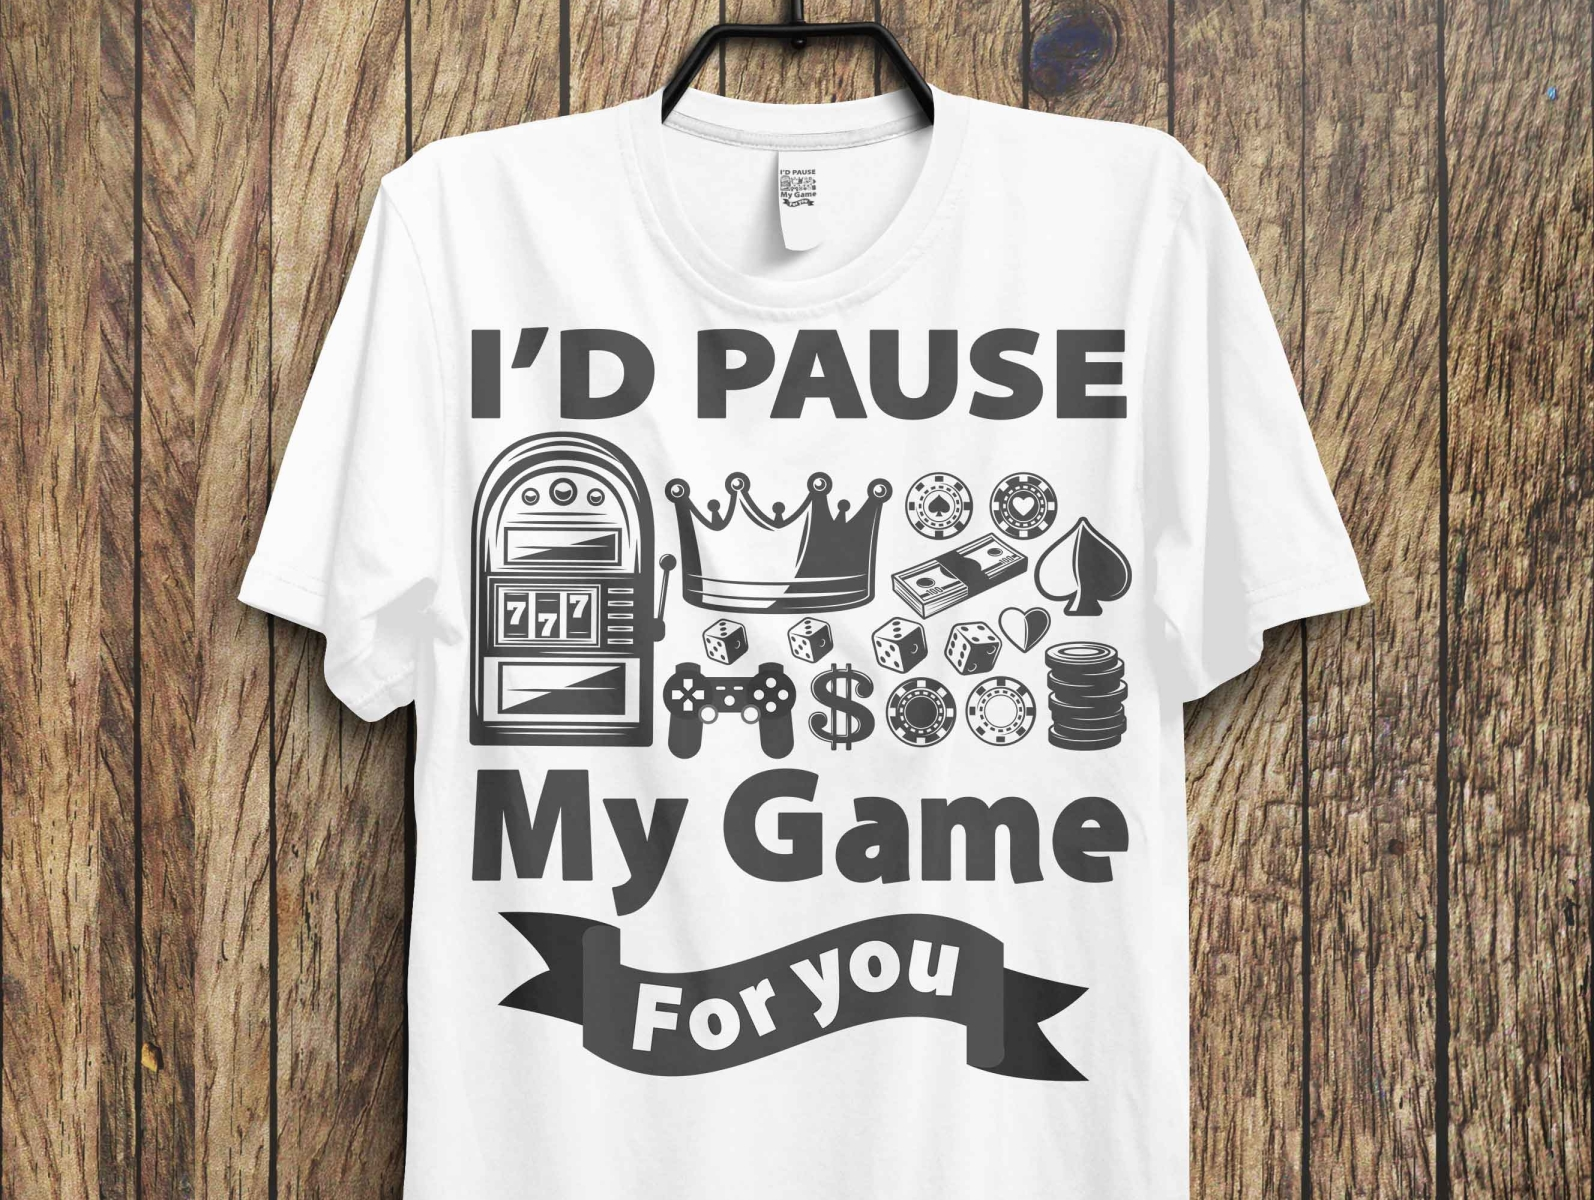 Gaming T-Shirt Design by Razzak on Dribbble